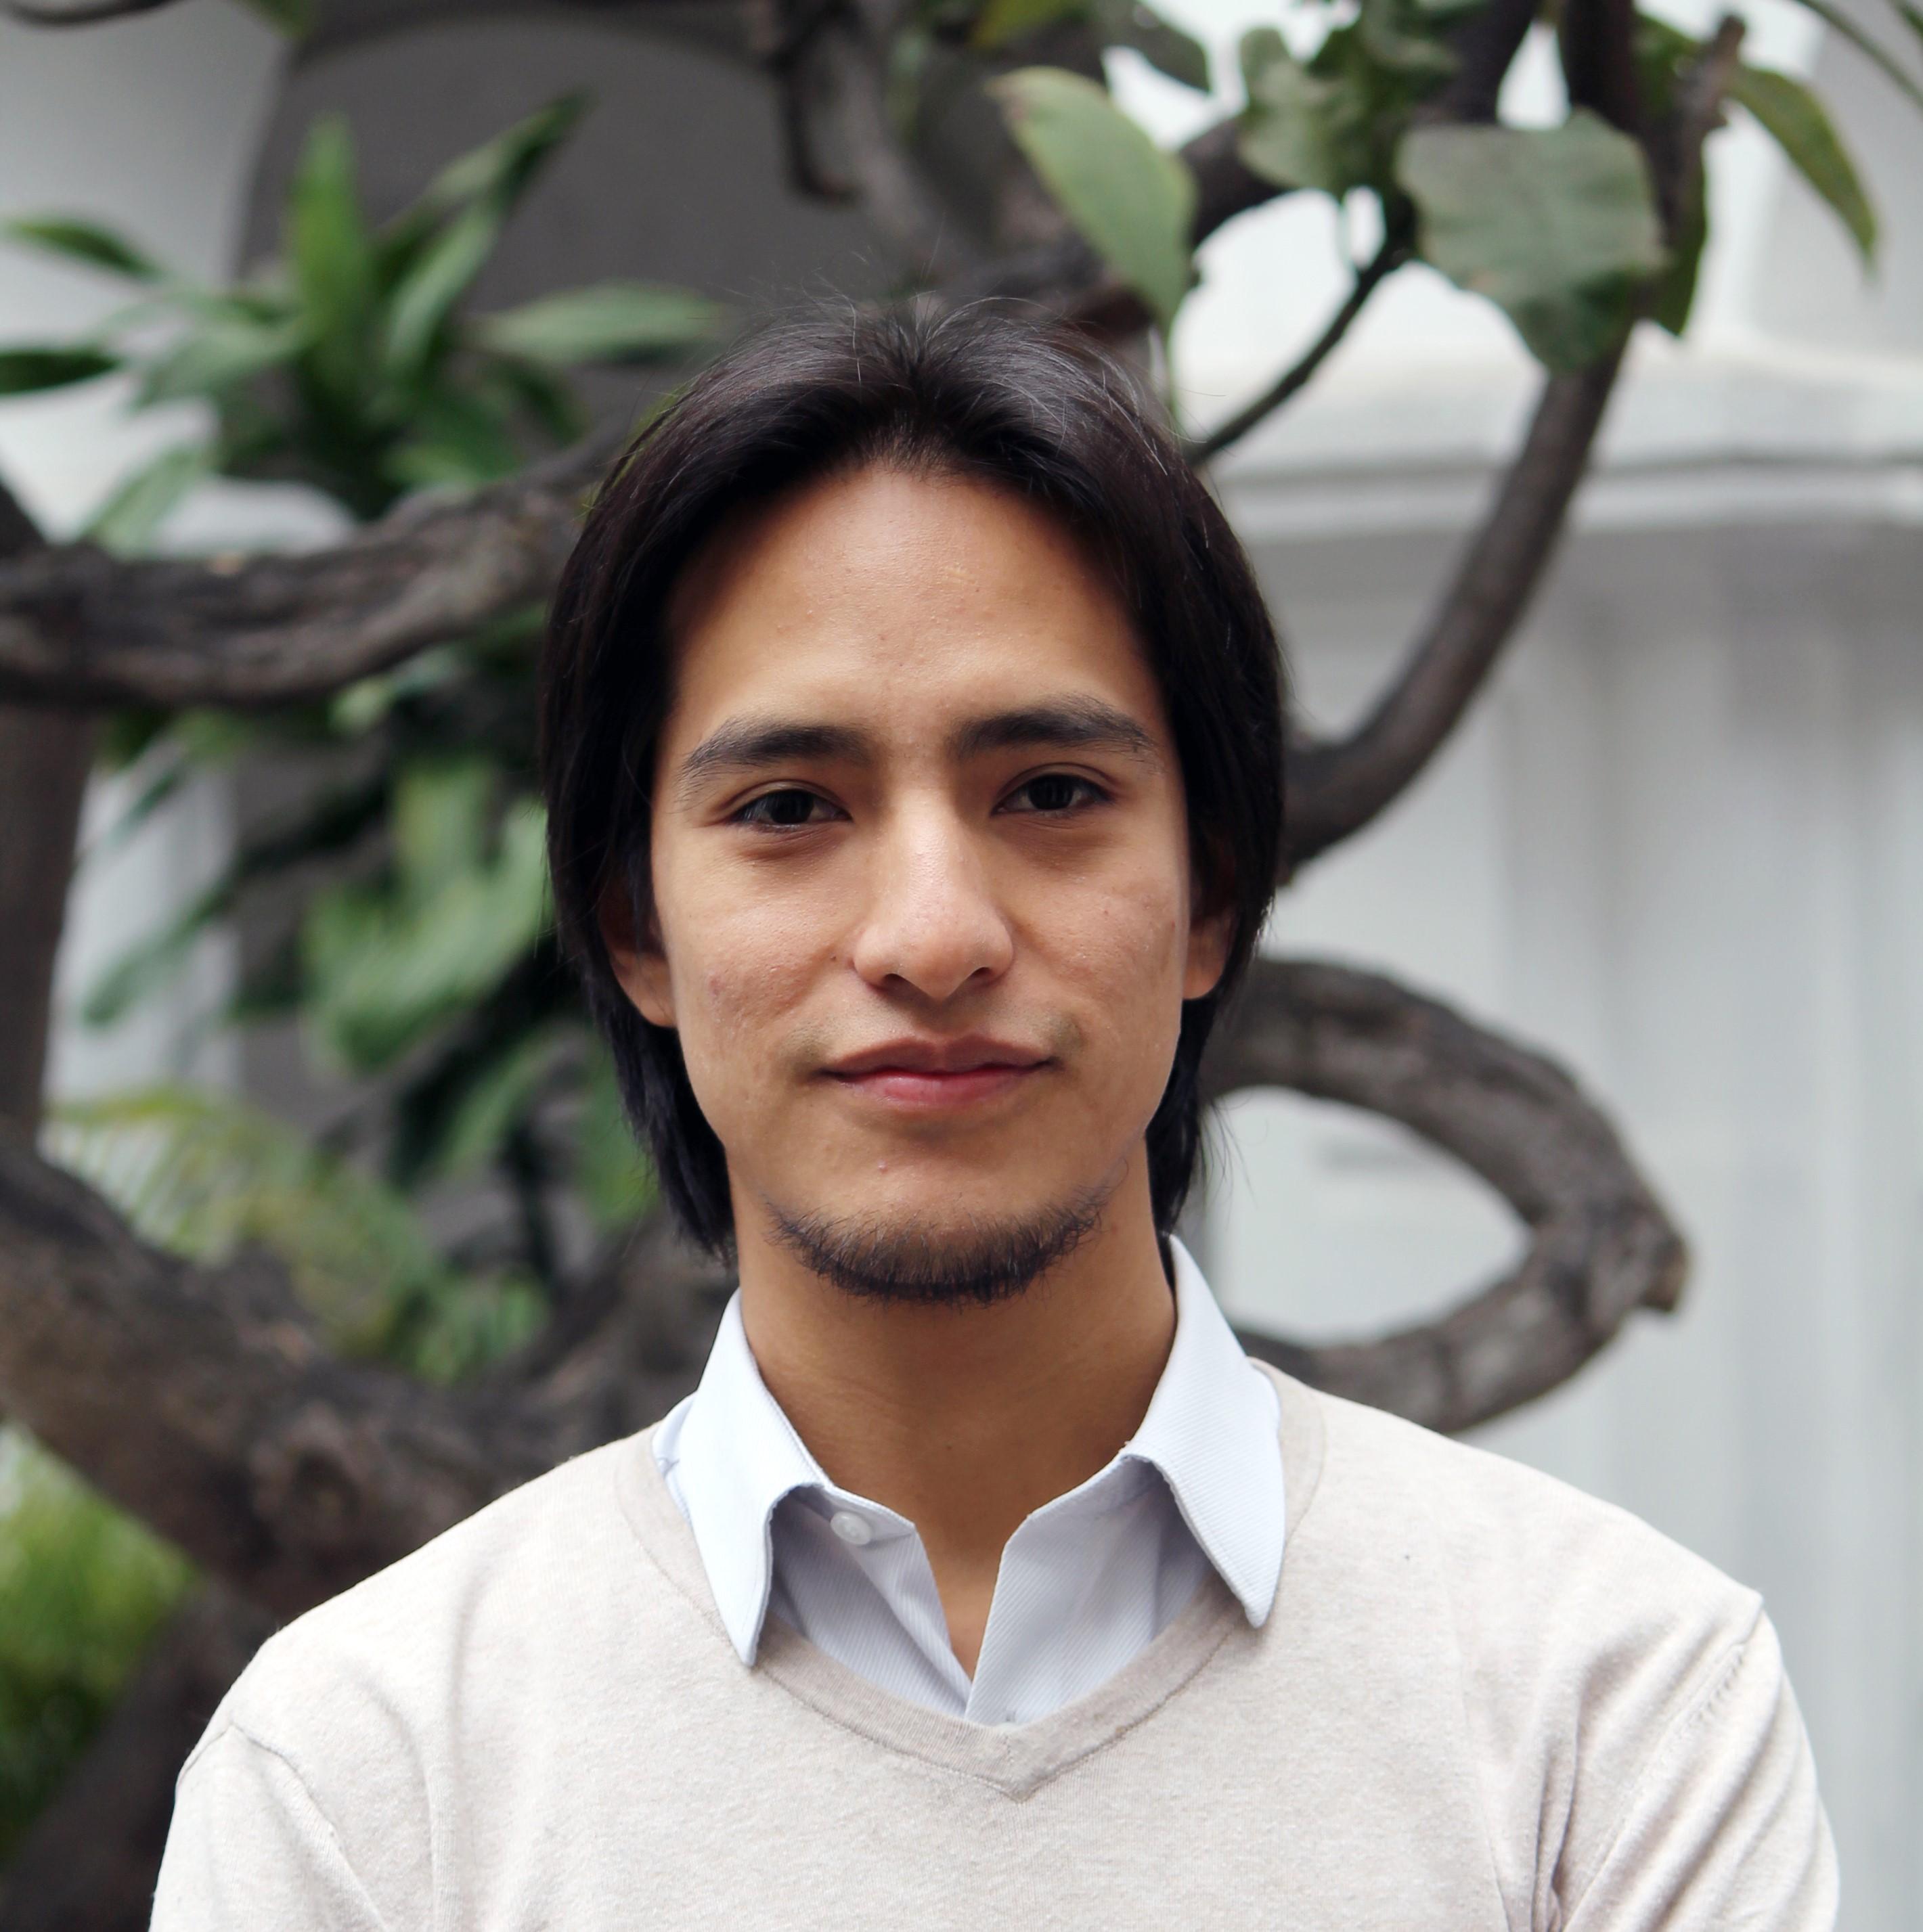 Eduardo Vargas Sánchez